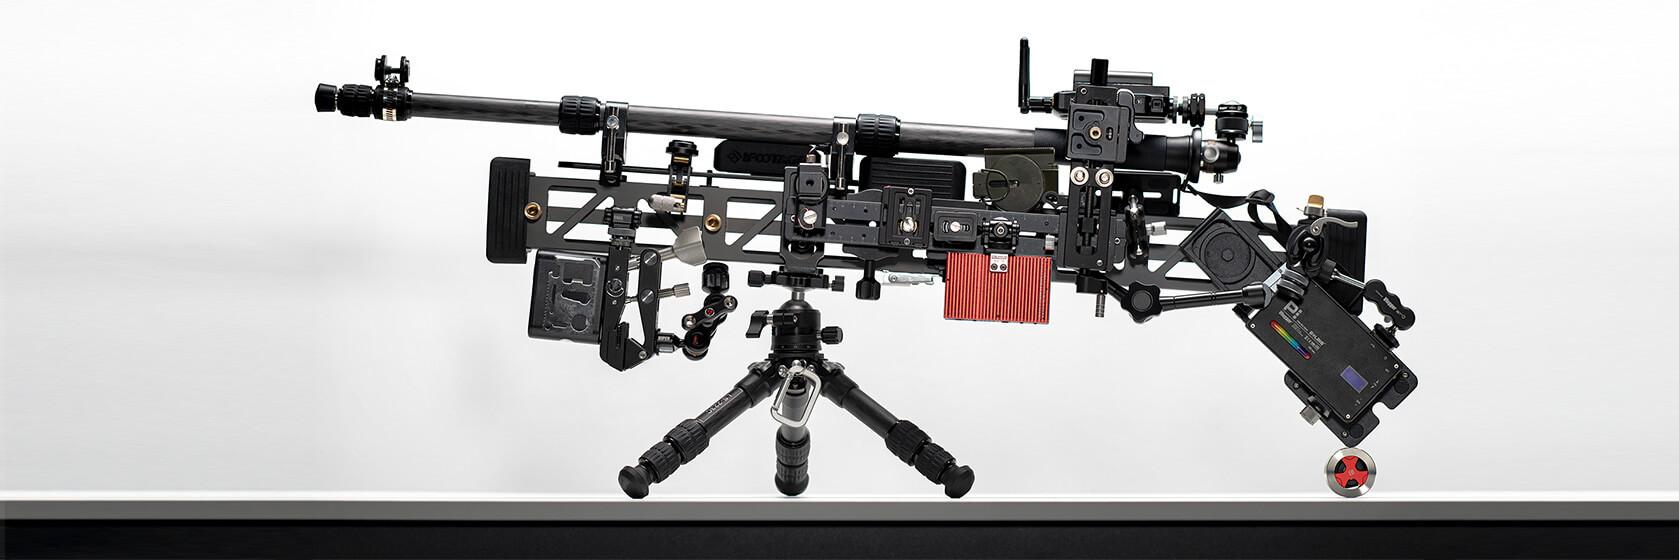 leofoto,相機三腳架雲台,三腳架,雲台,全景攝影